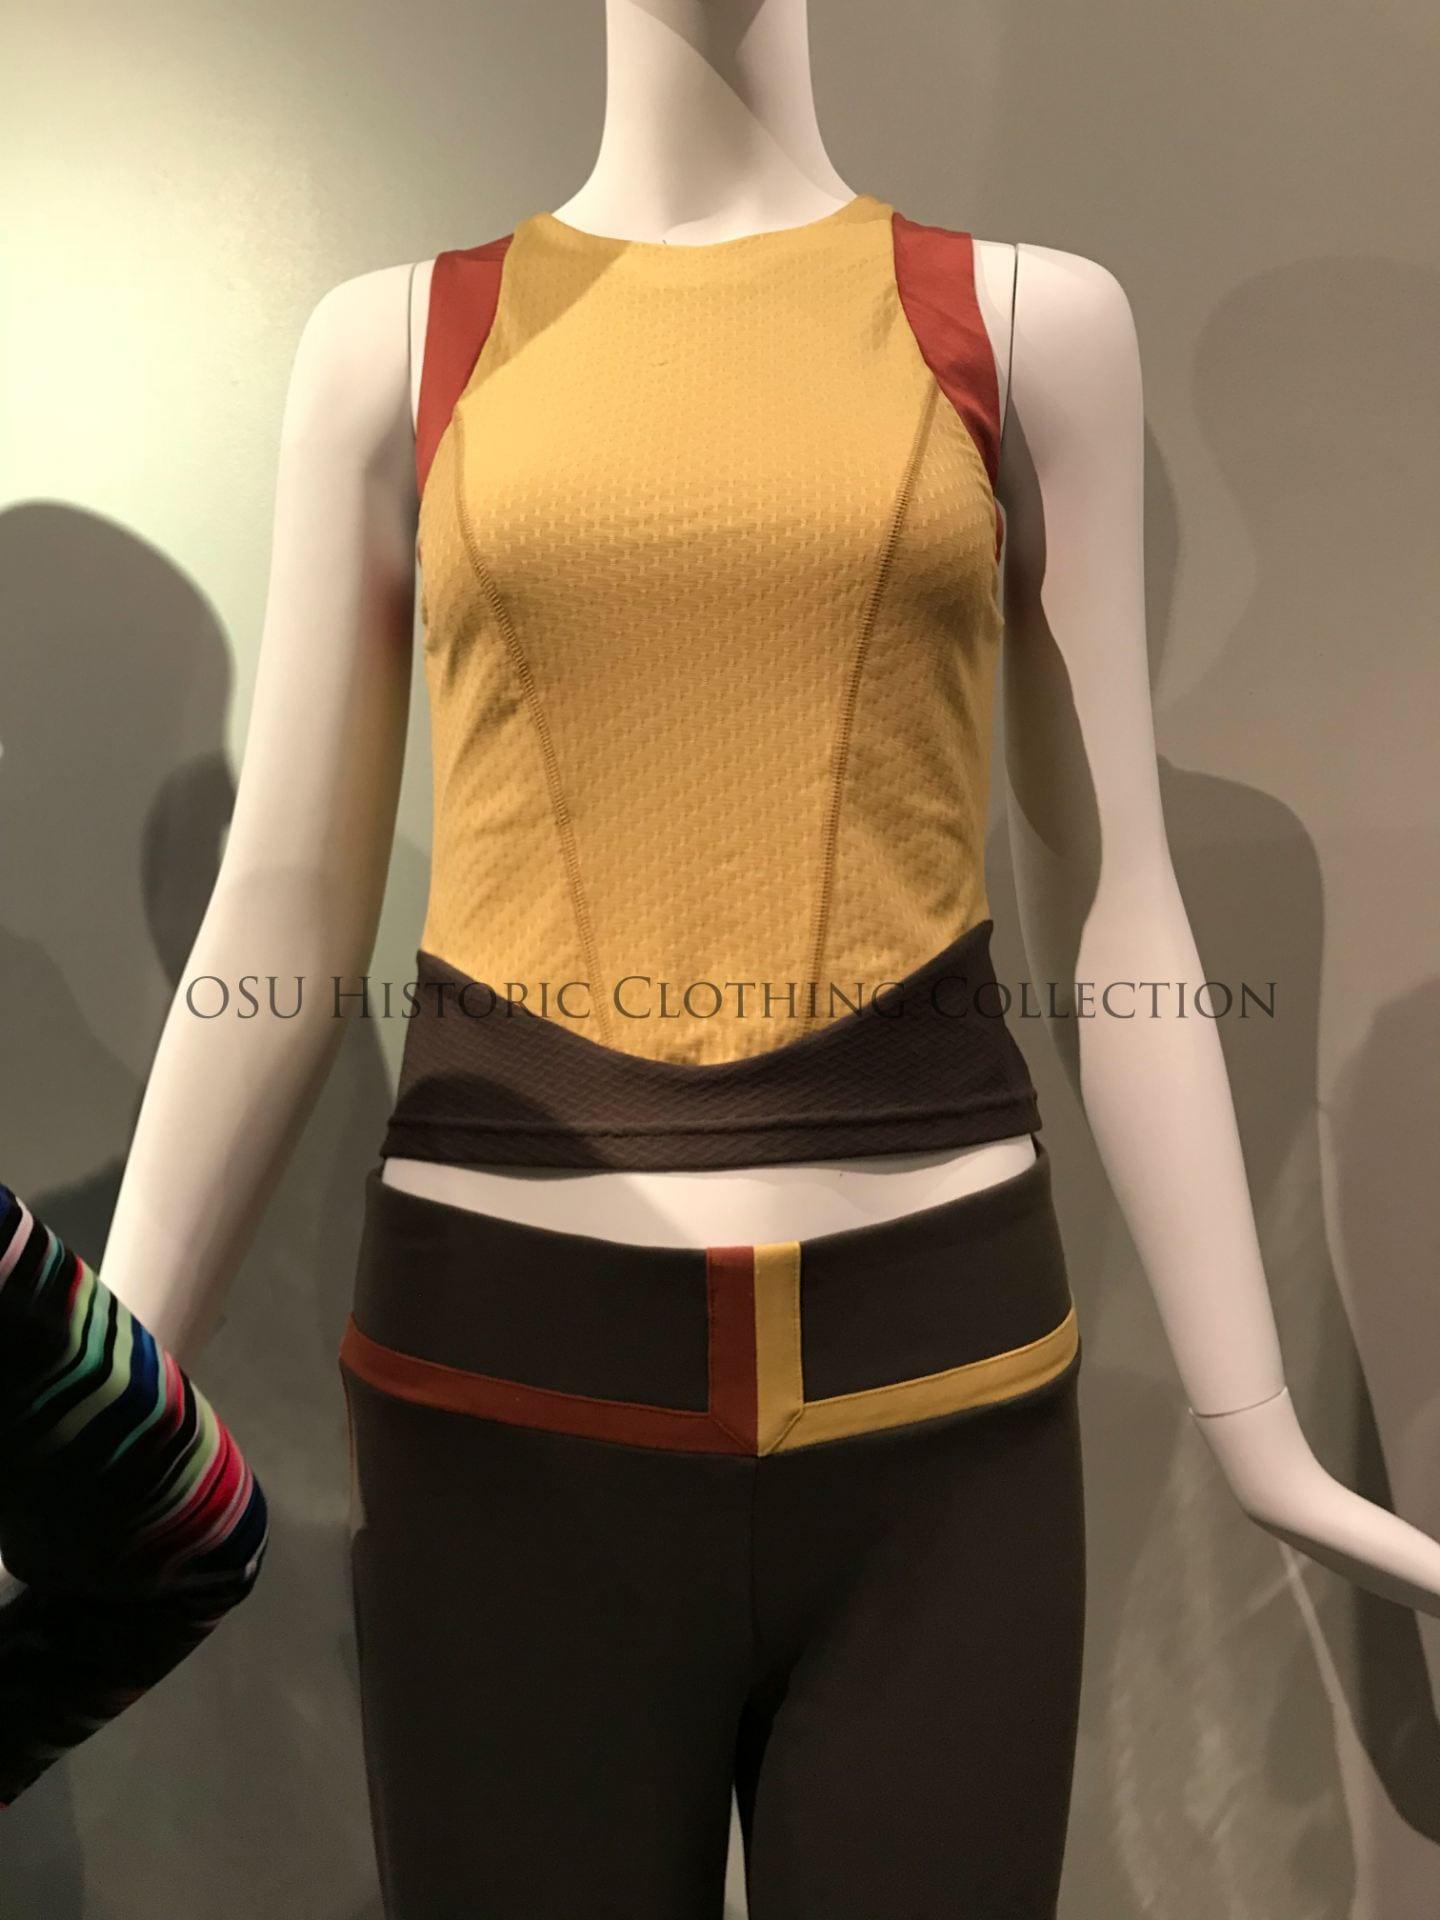 0b01b74521ca18 Uncategorized | Clothes Lines | Page 2